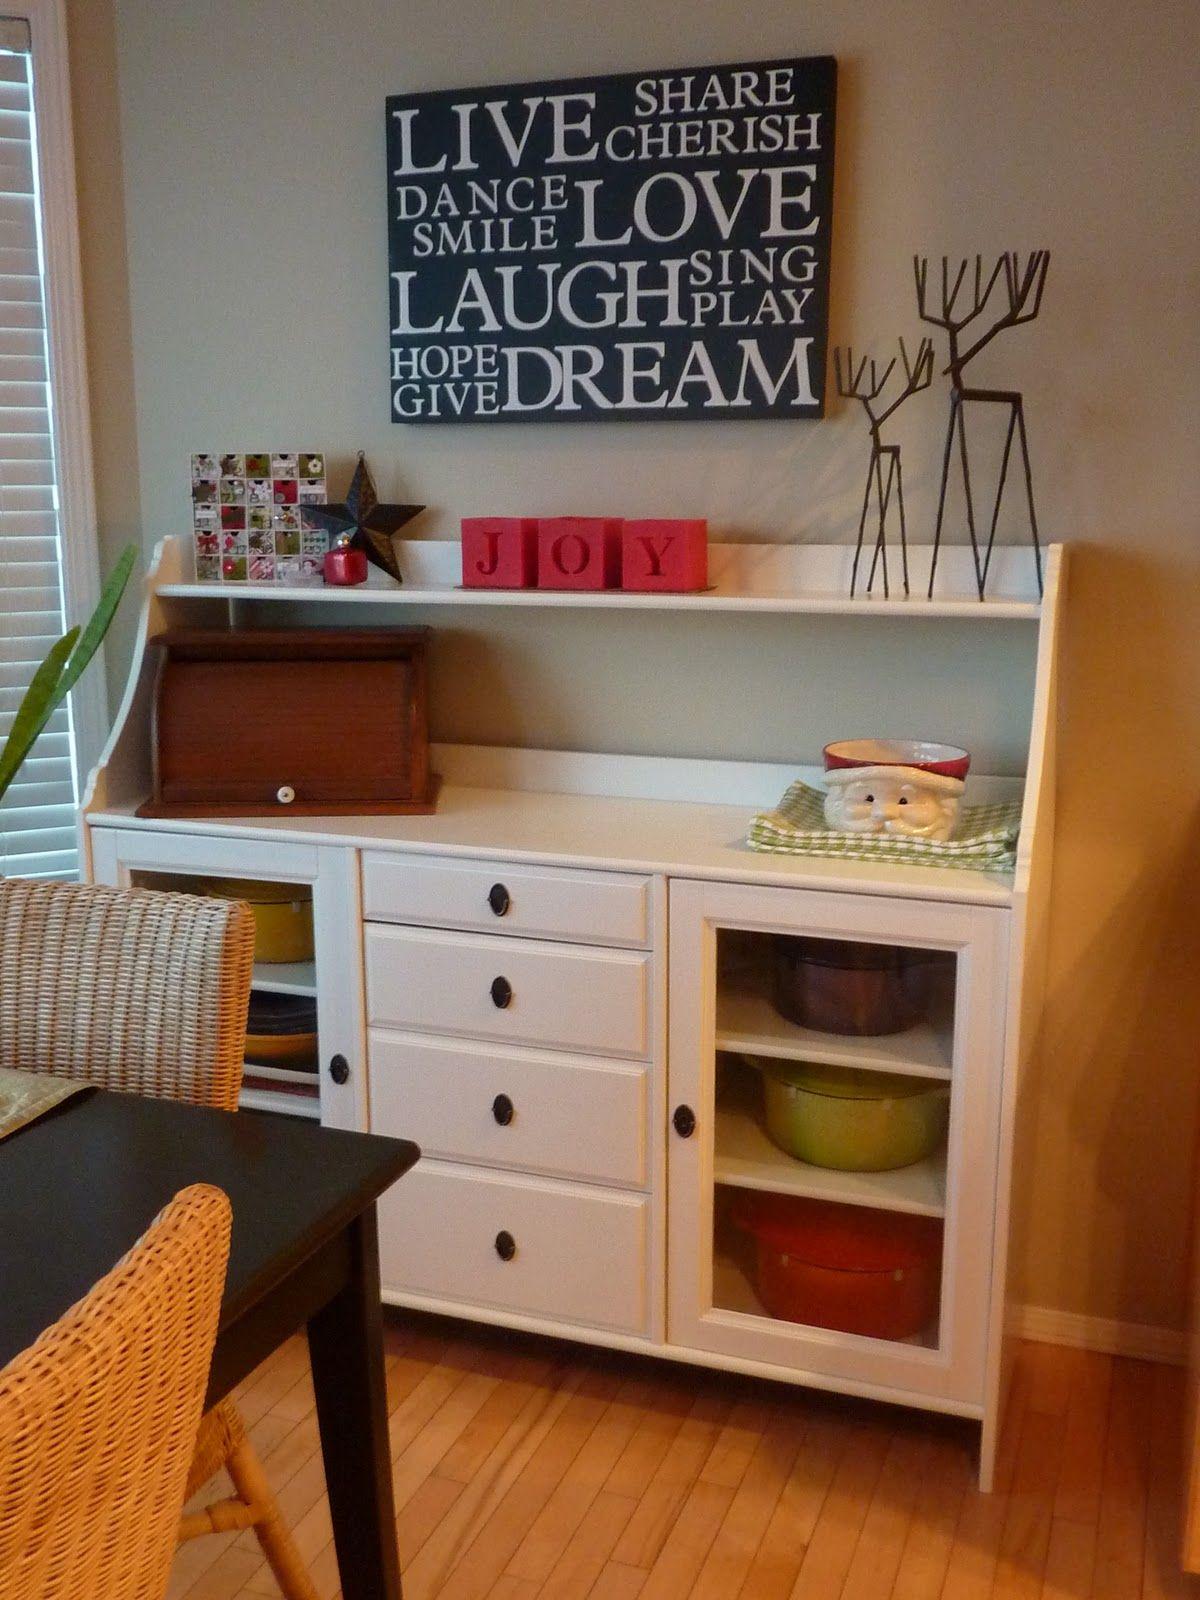 My Crafty Days: Ikea Furniture Redo & Nook Makeover | Decor ...